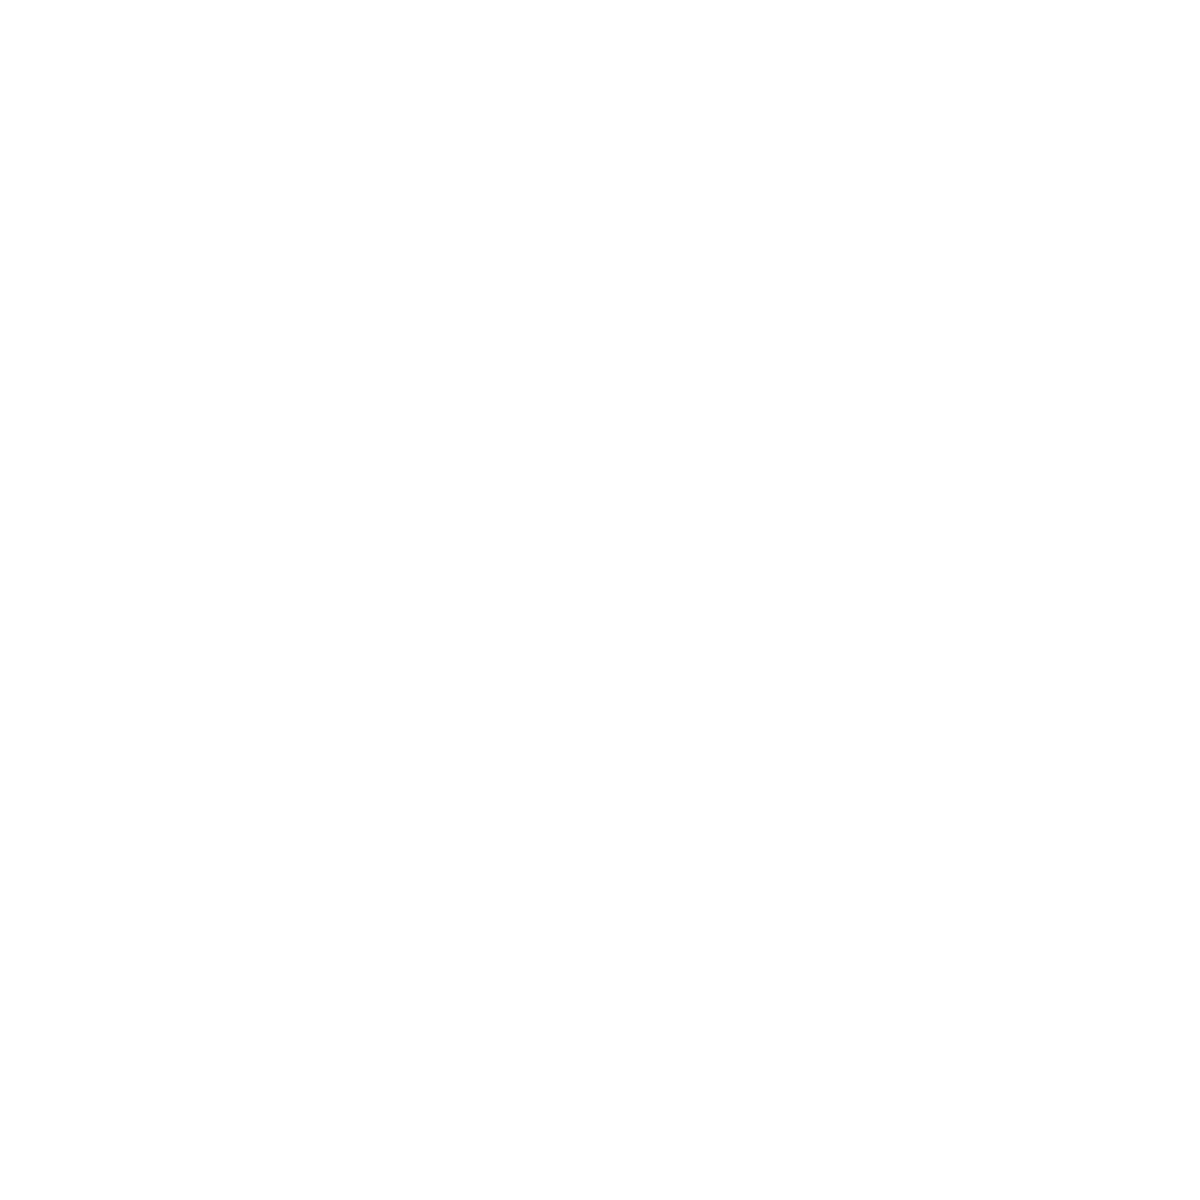 College Logos5.png